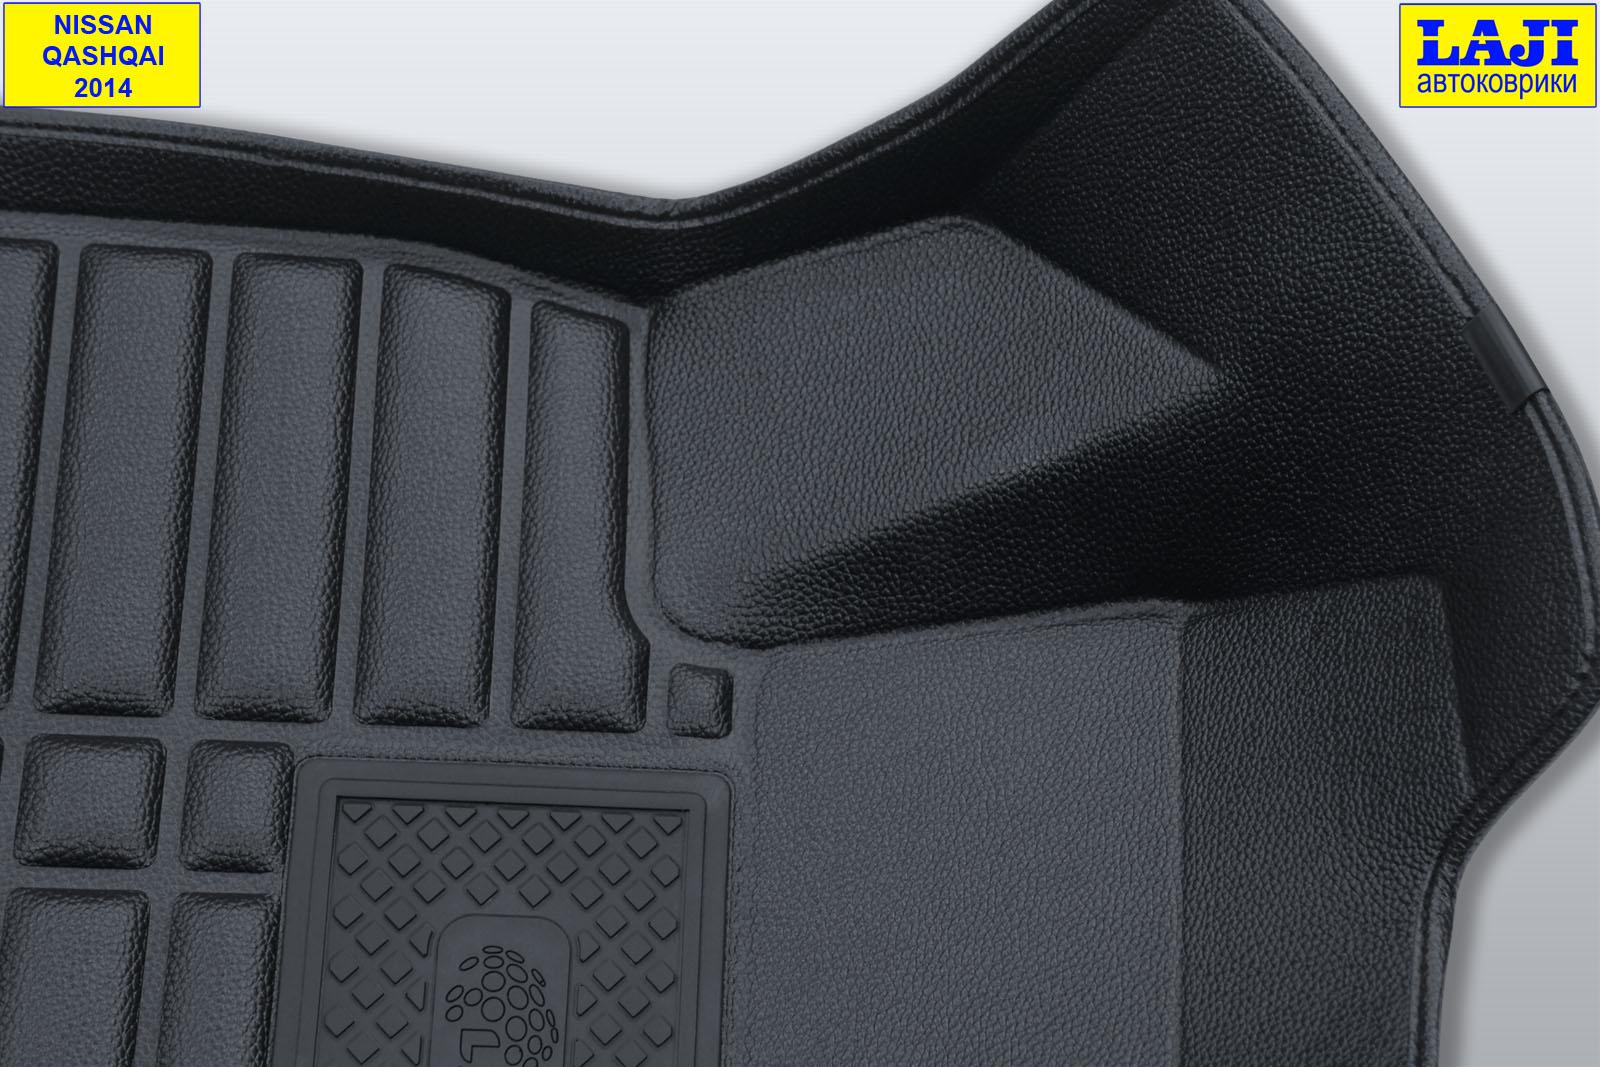 5D коврики в салон NIssan Qashqai J11 (Eng) 2014 6